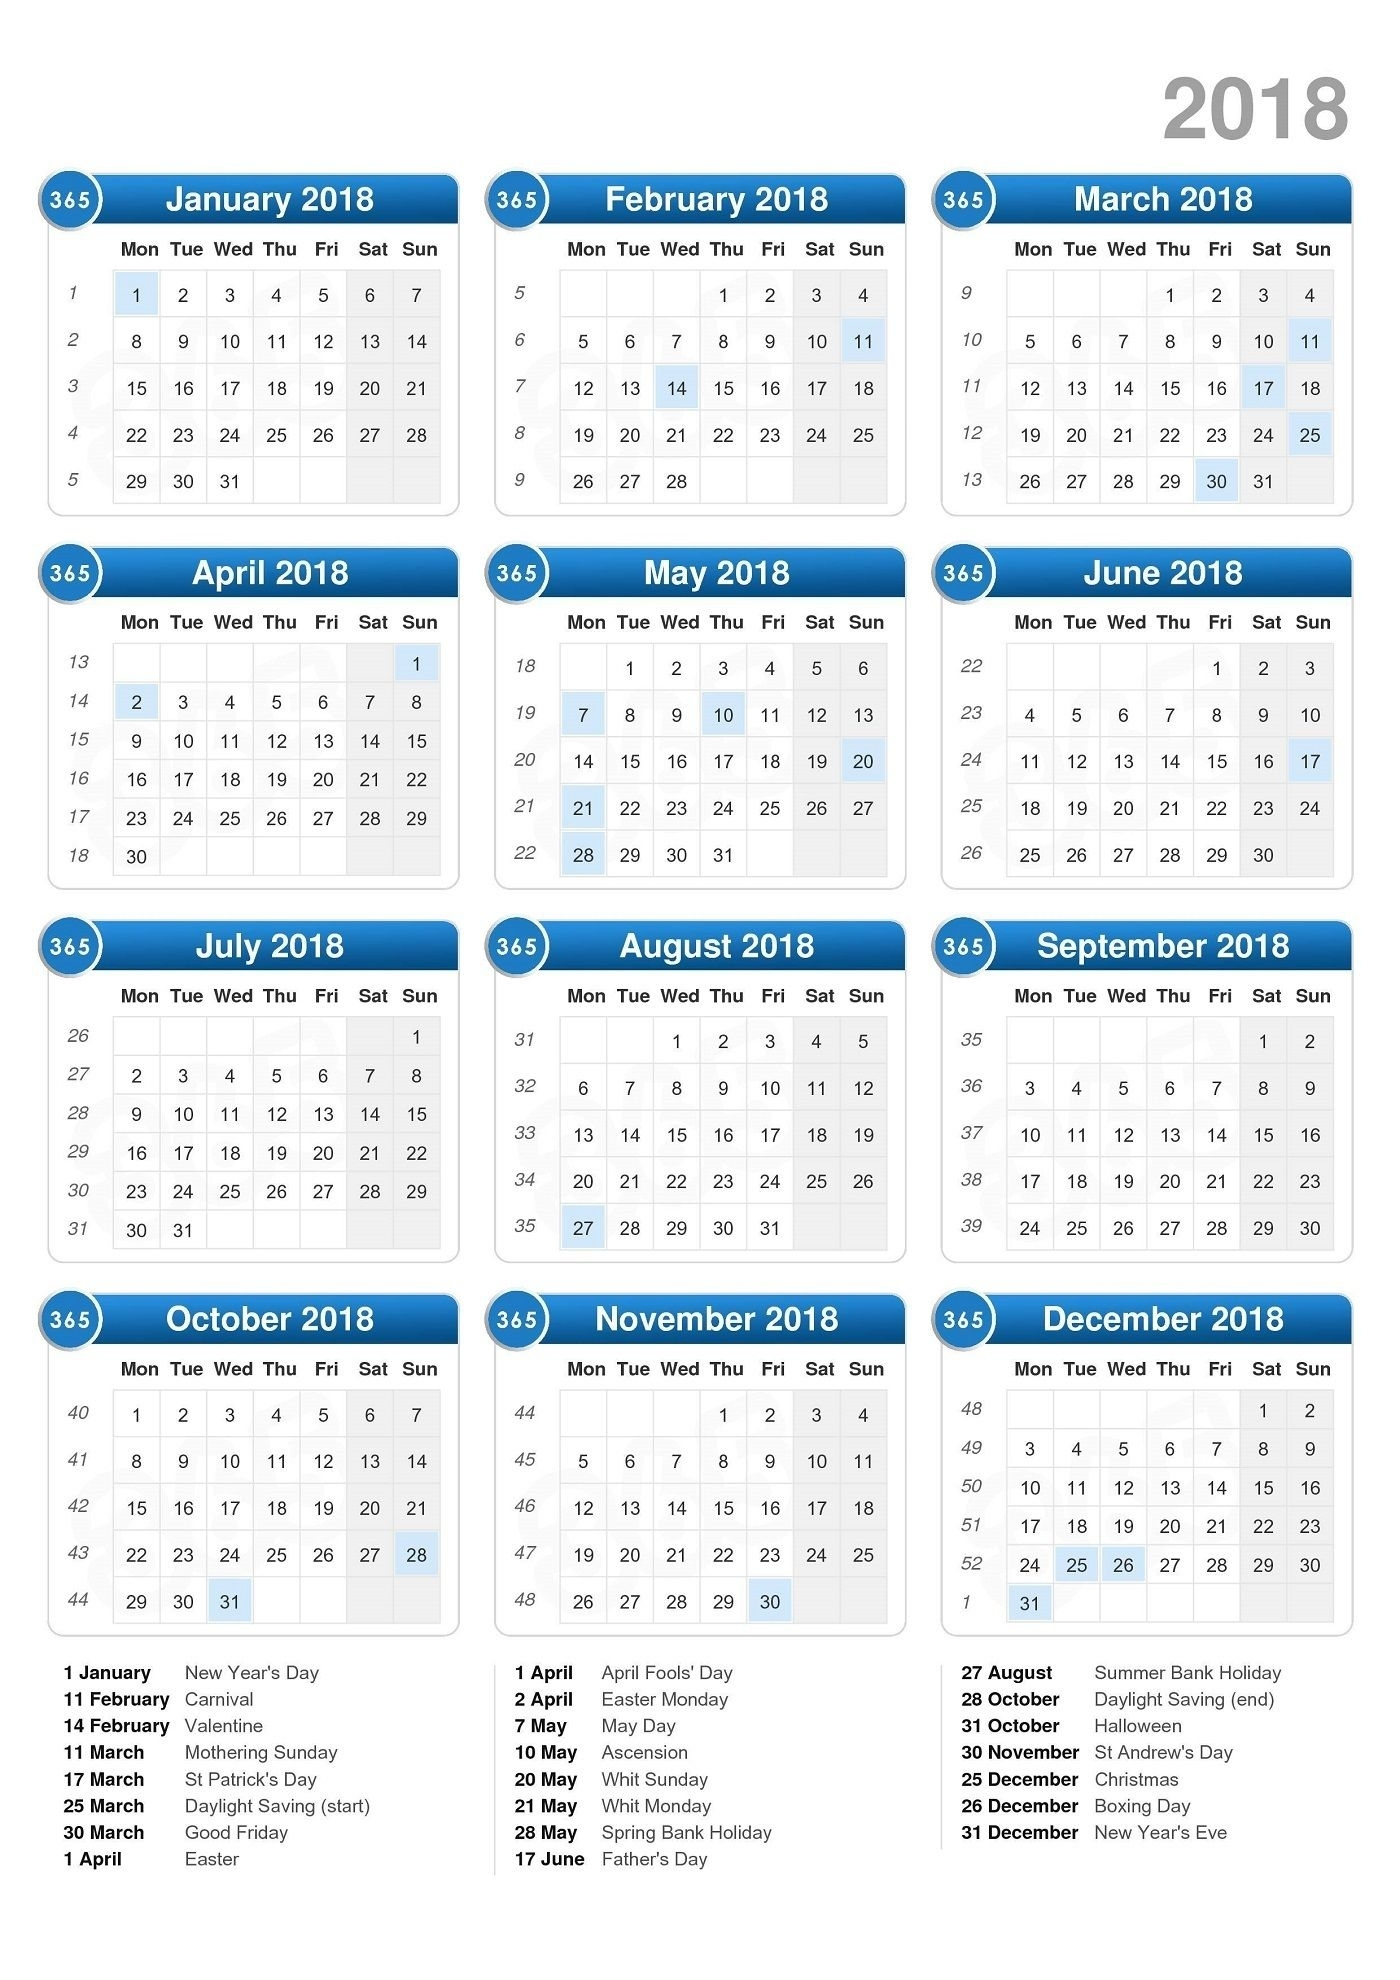 Free Calendars 2018 Printable | Print Calendar, Printable